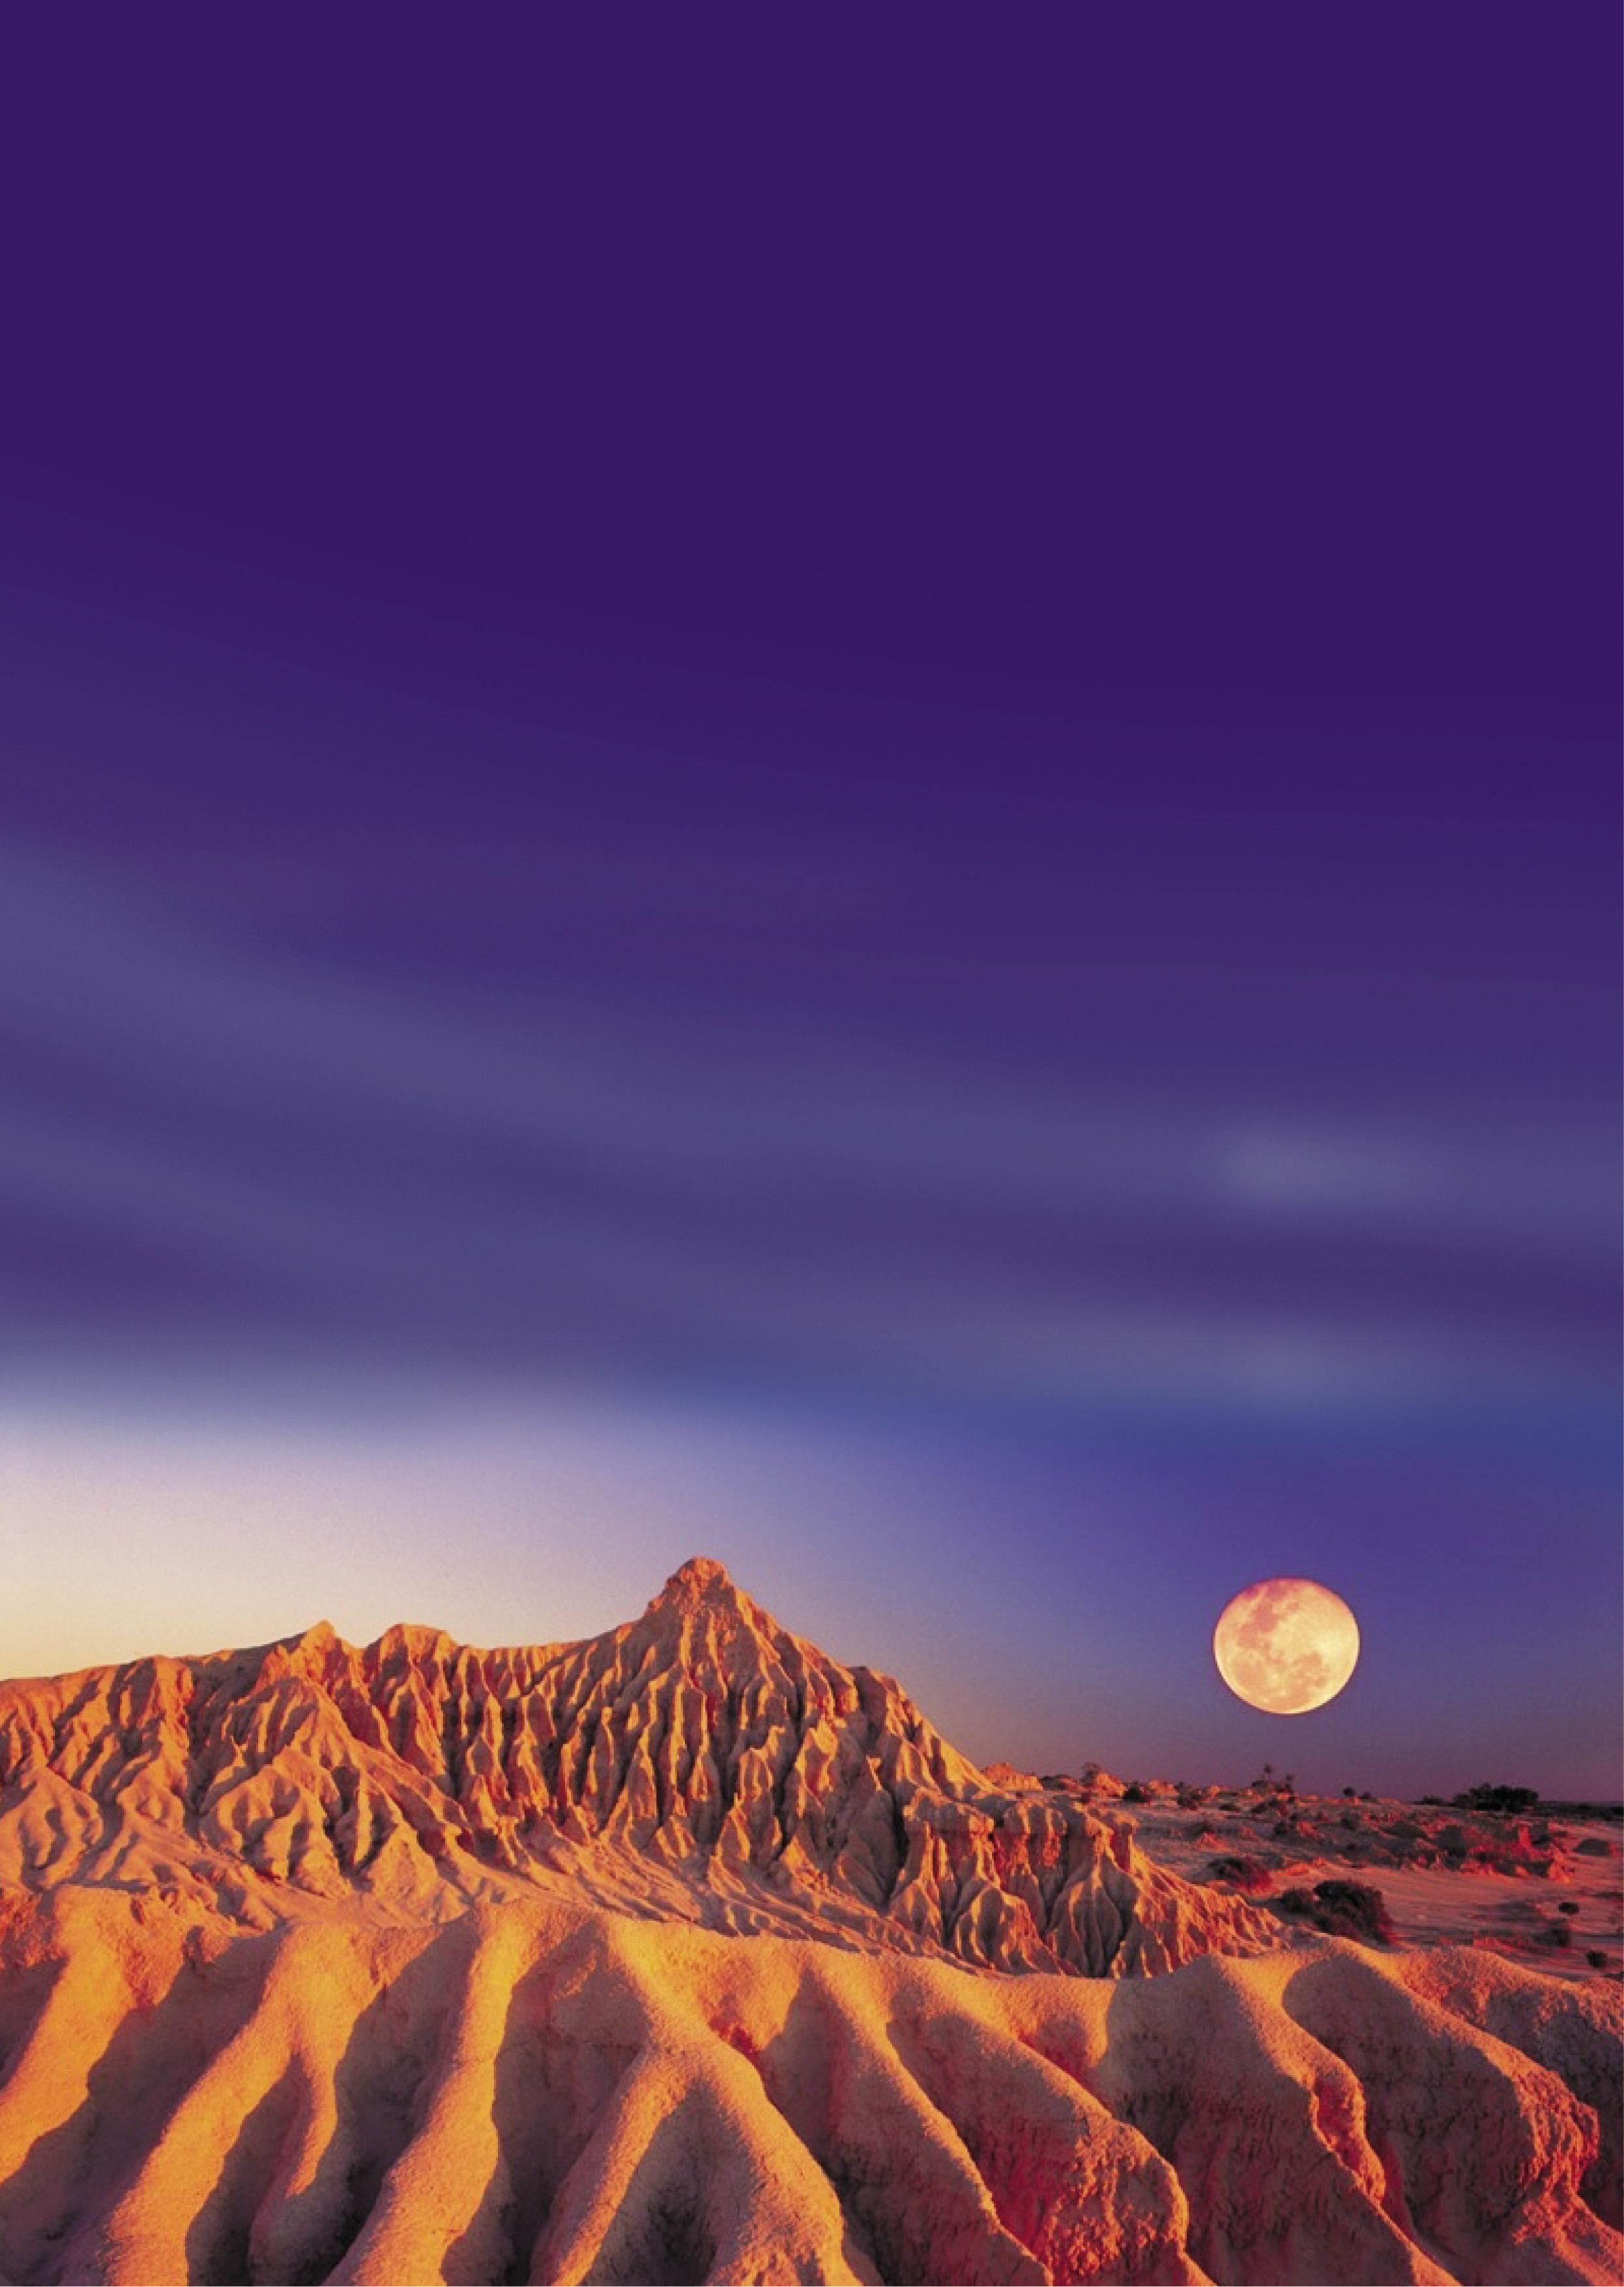 Moon over Mungo copy.jpg